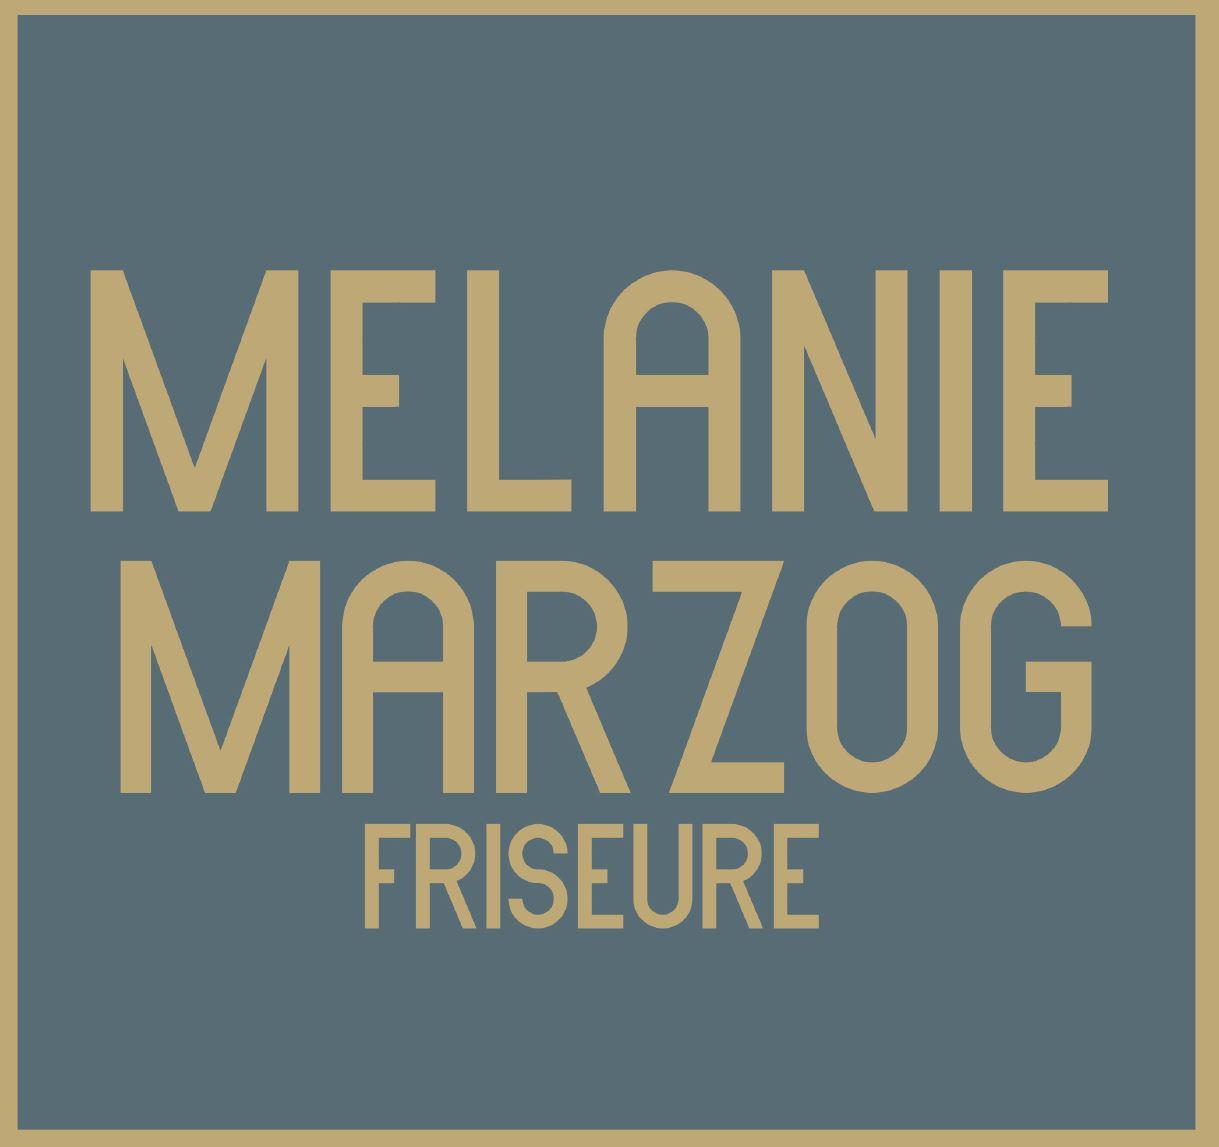 Melanie Marzog Friseure